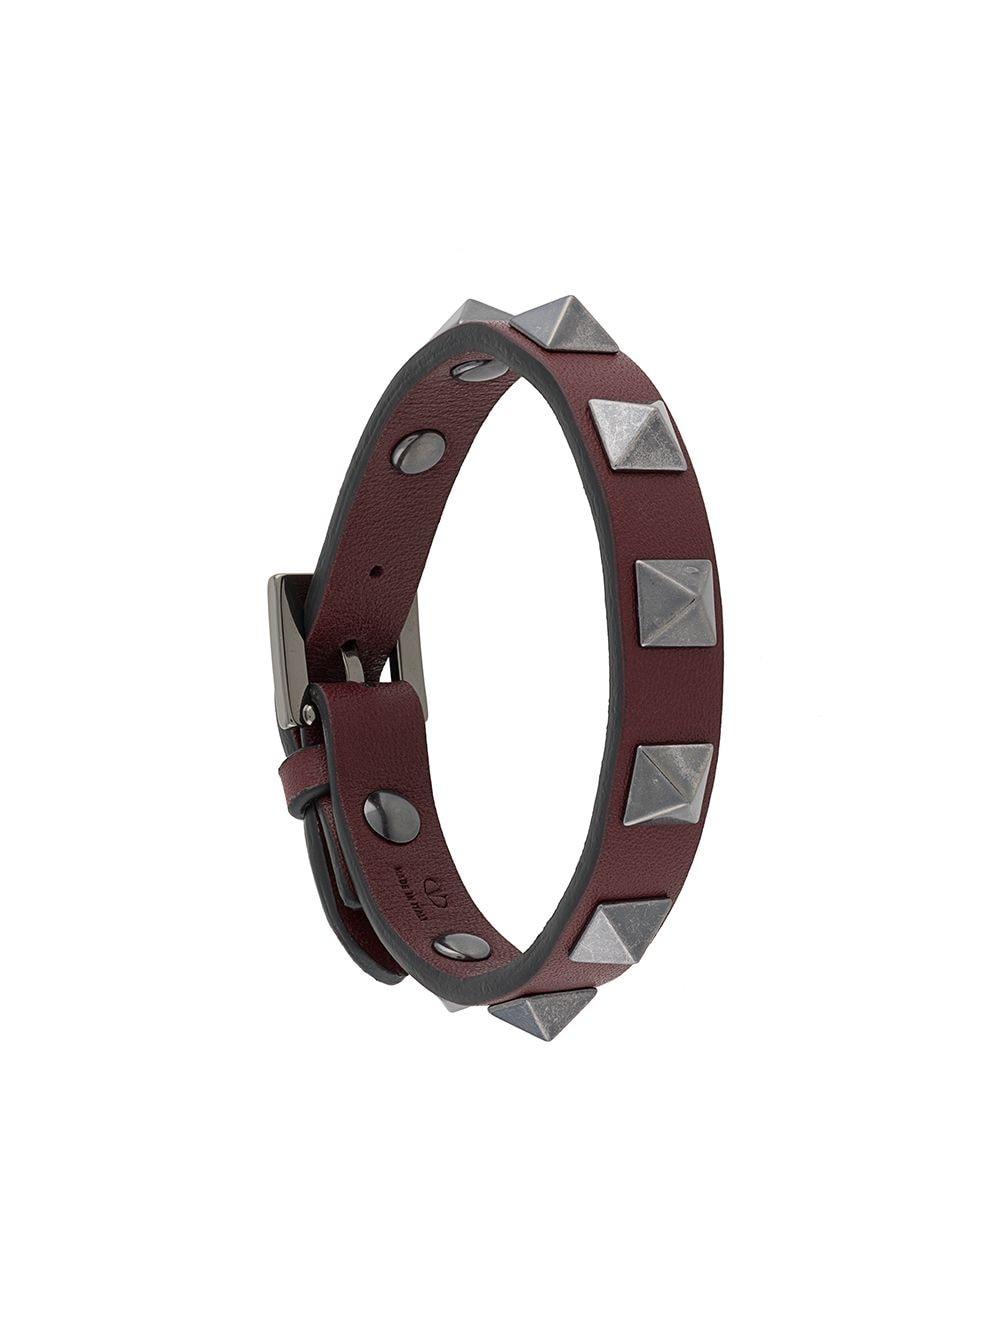 Leather Bracelet With Studs